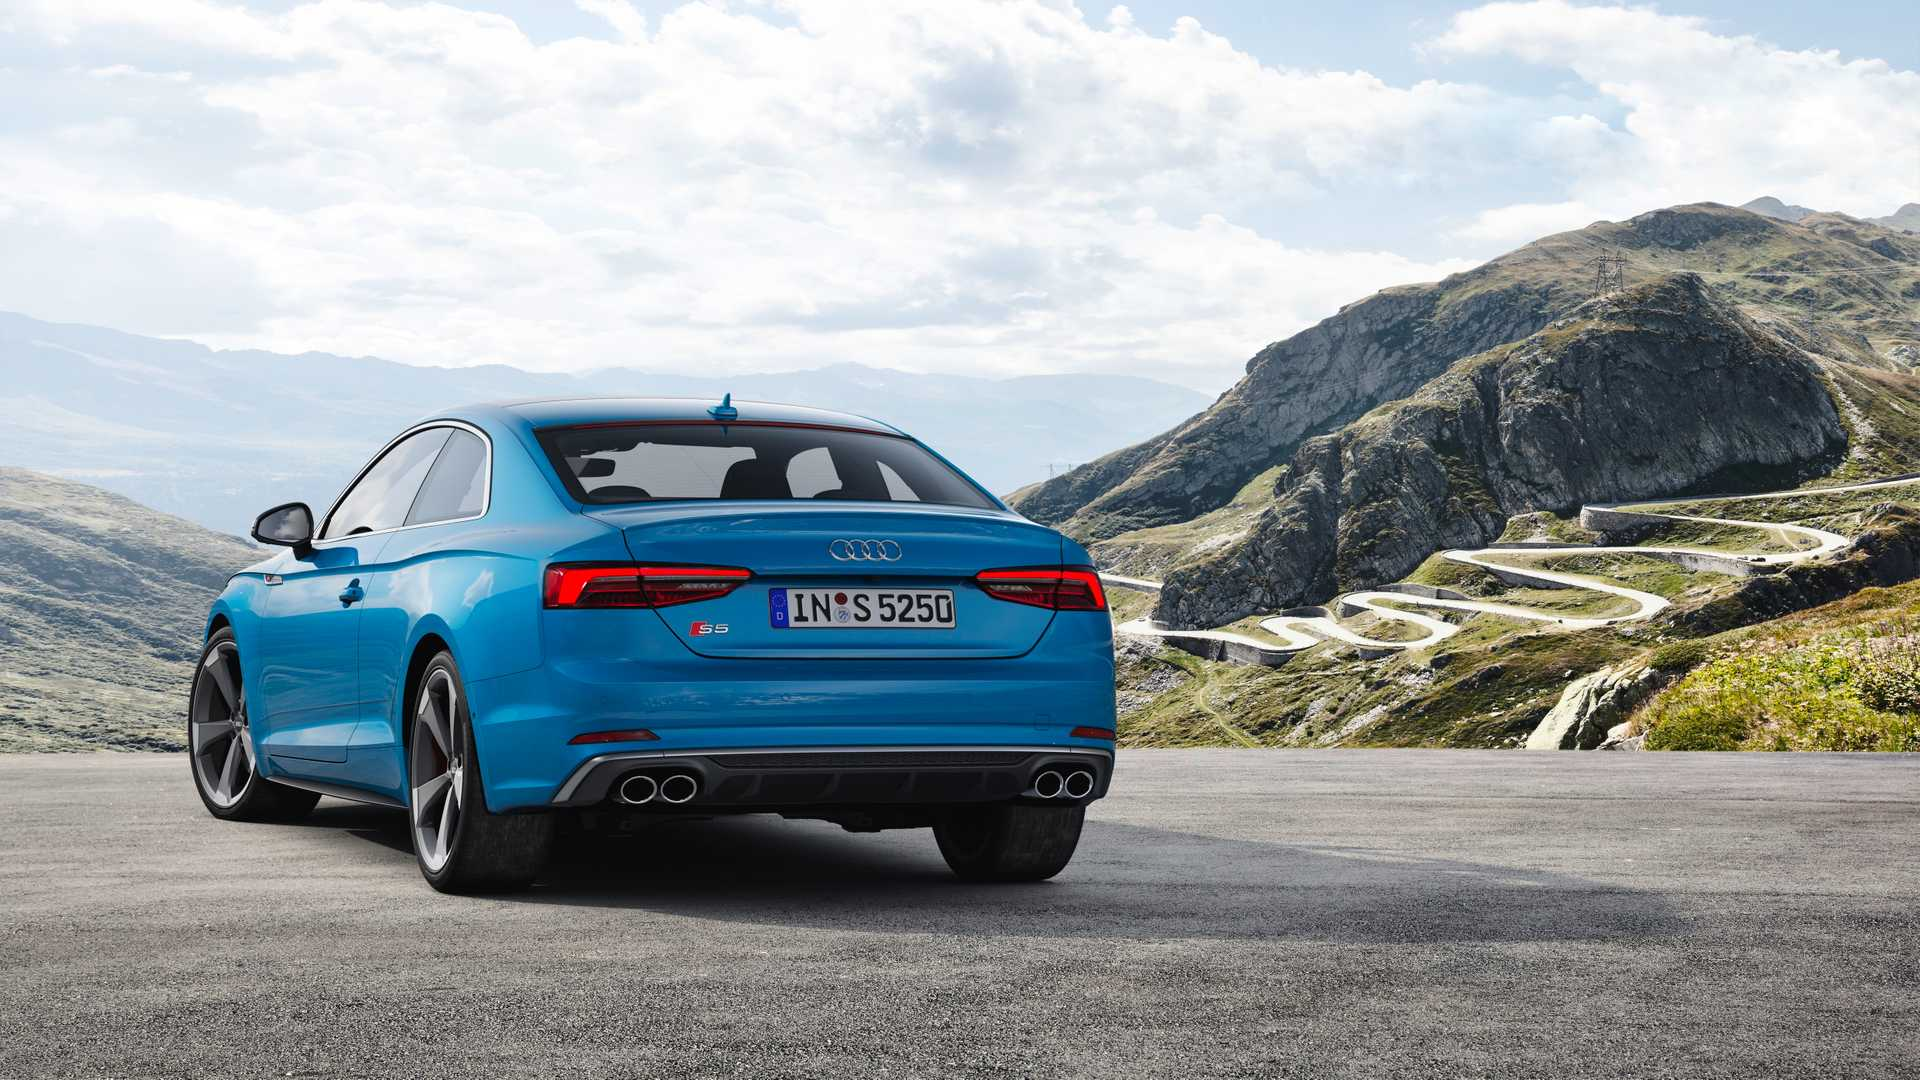 2019 Audi S5 Coupé TDI Rear Wallpaper (10)